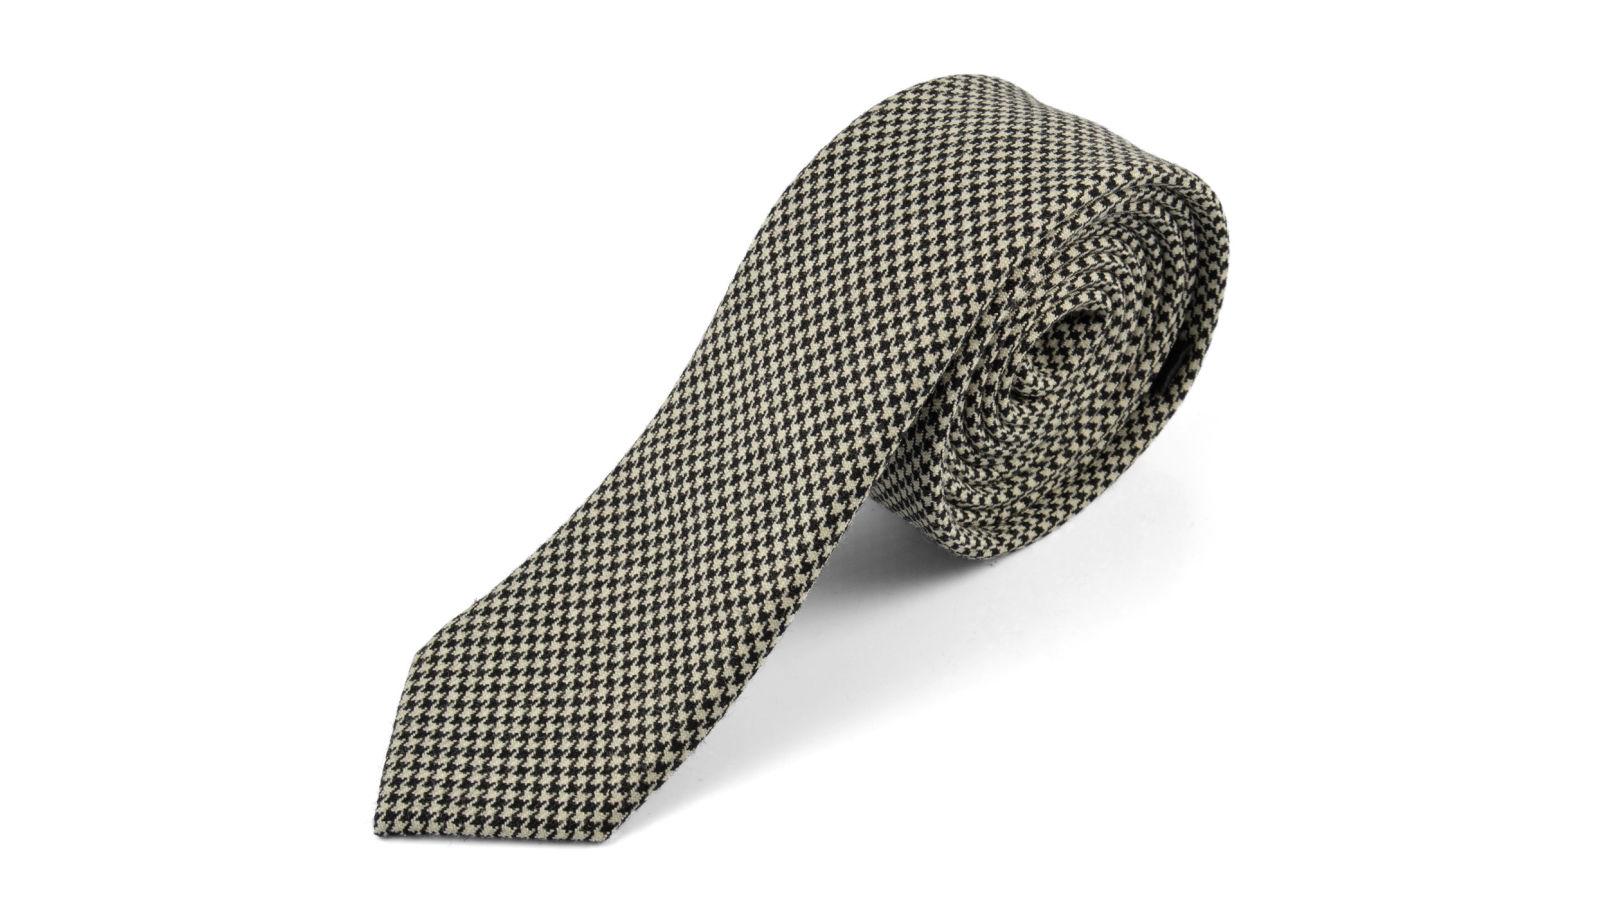 48350e10e84e Μάλλινη Γραβάτα Fifties